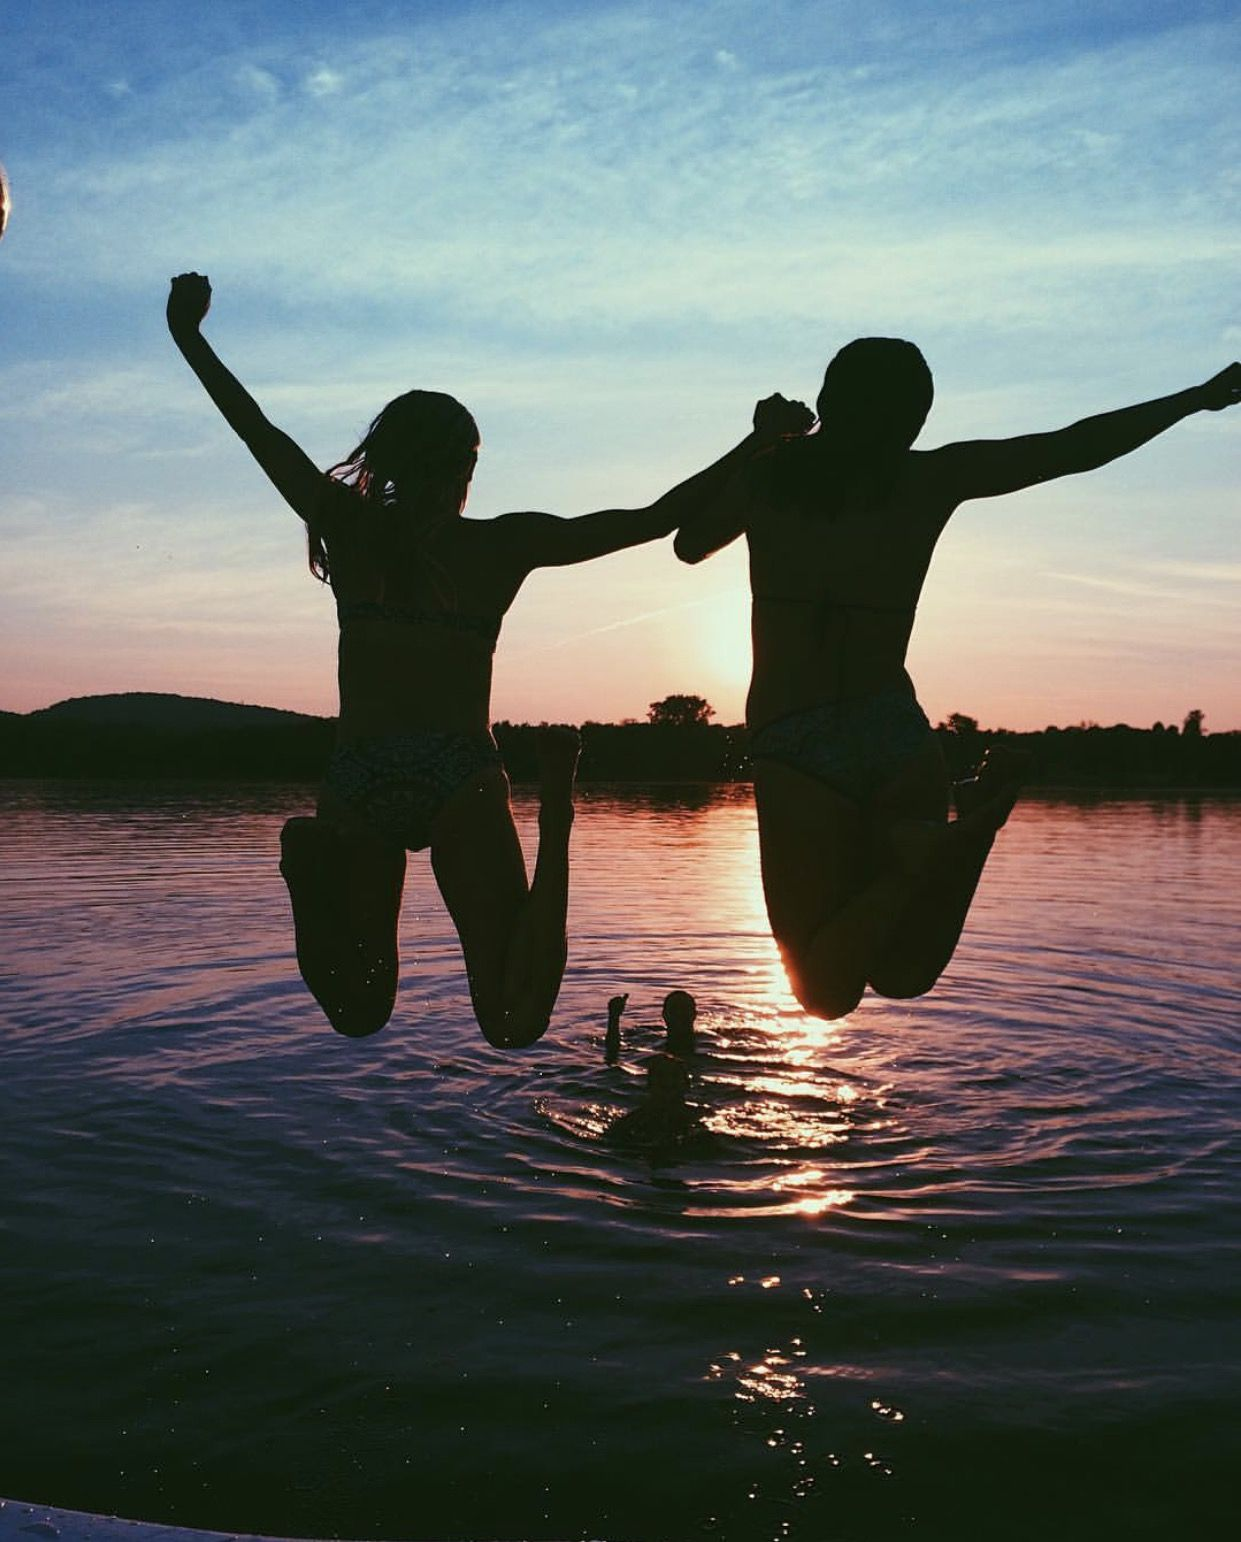 Water Lake Sunset Pretty Jumping Boat Girls Teen Tumblr -7159